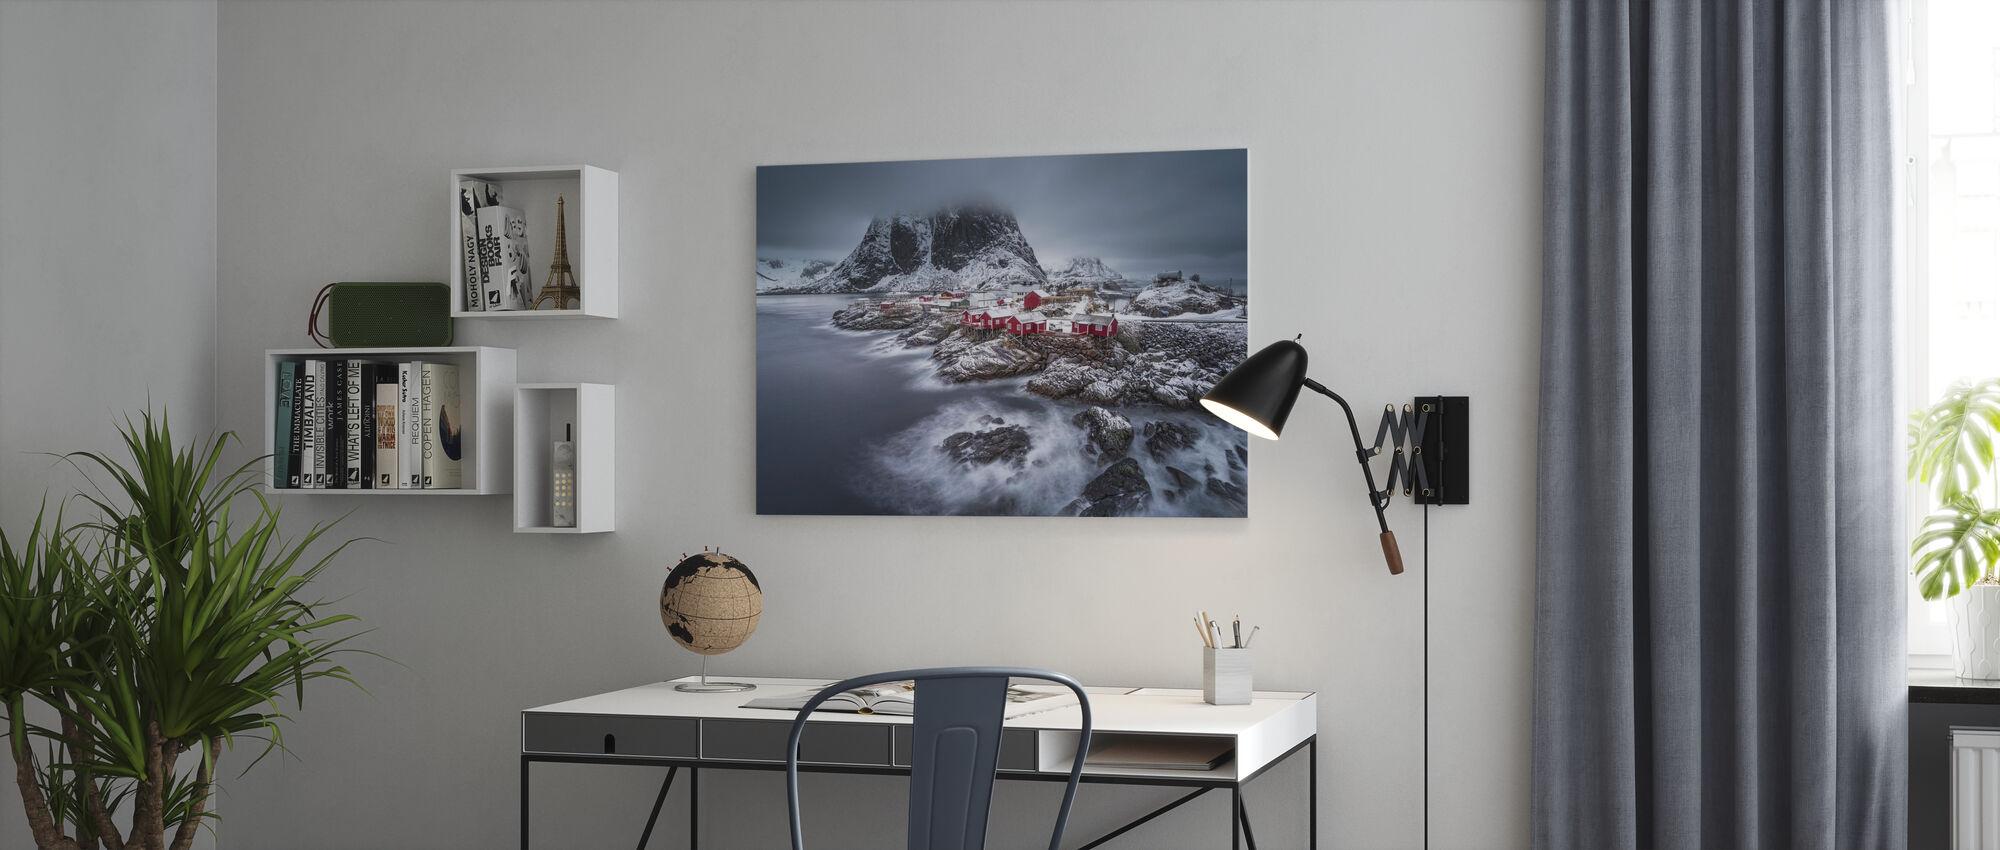 Winter Lofoten Islands - Canvastavla - Kontor